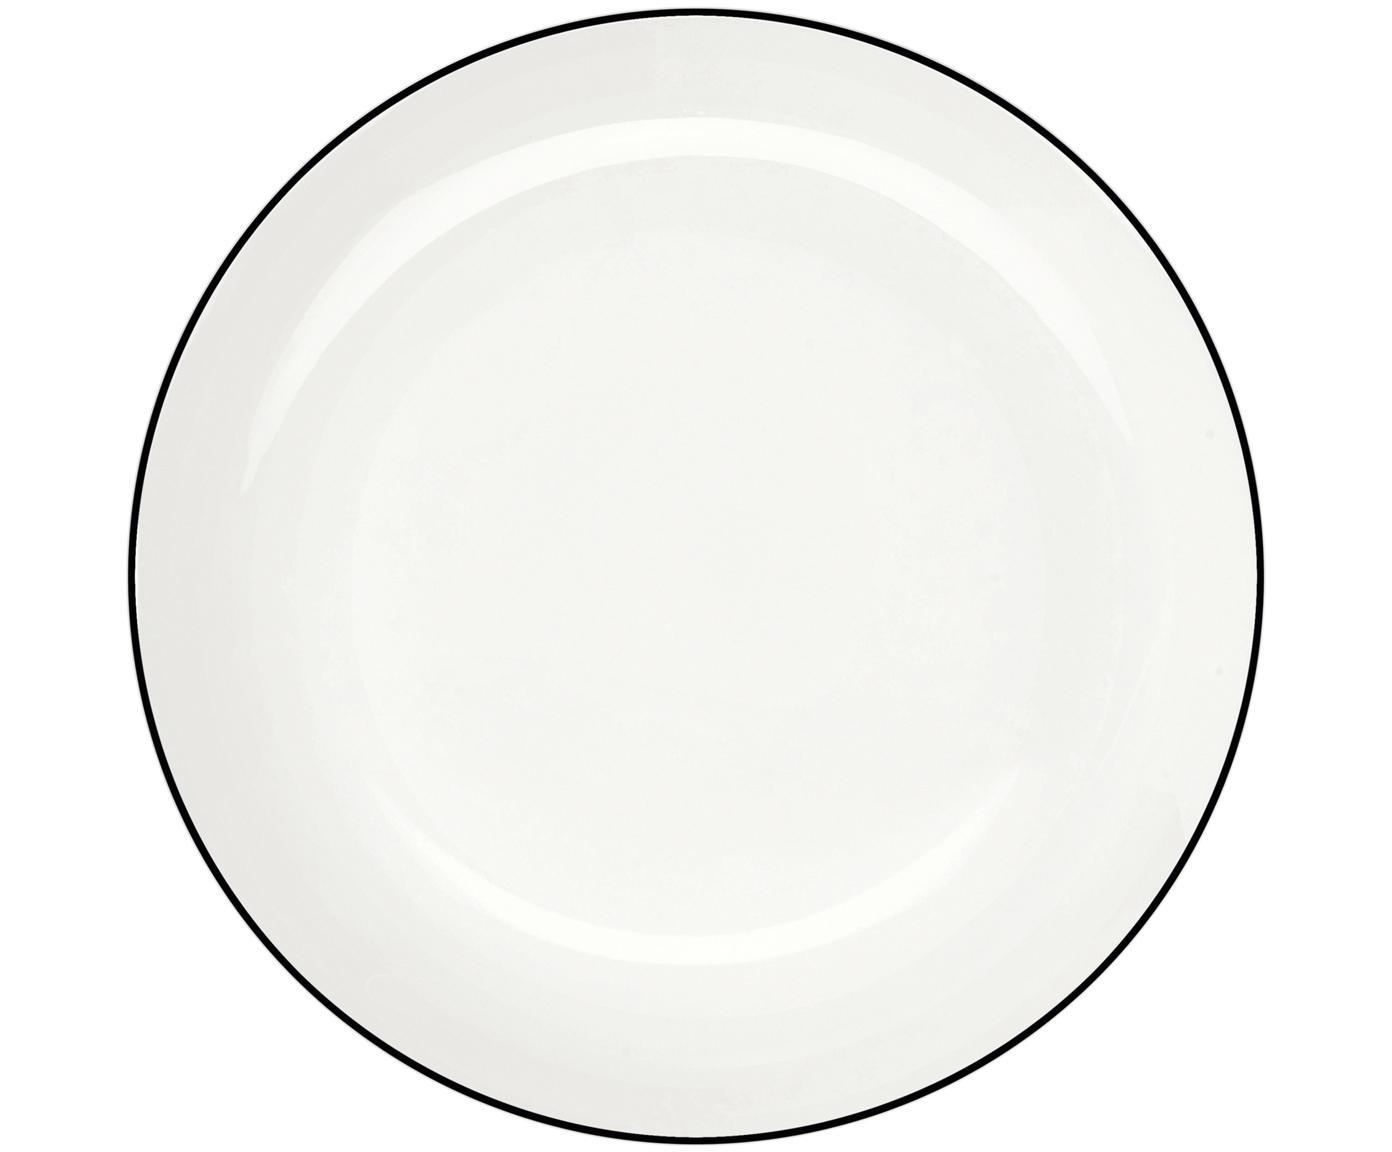 Pastaborden á table ligne noir, 4 stuks, Beenderporselein, Wit. Rand: zwart, Ø 22 x H 5 cm